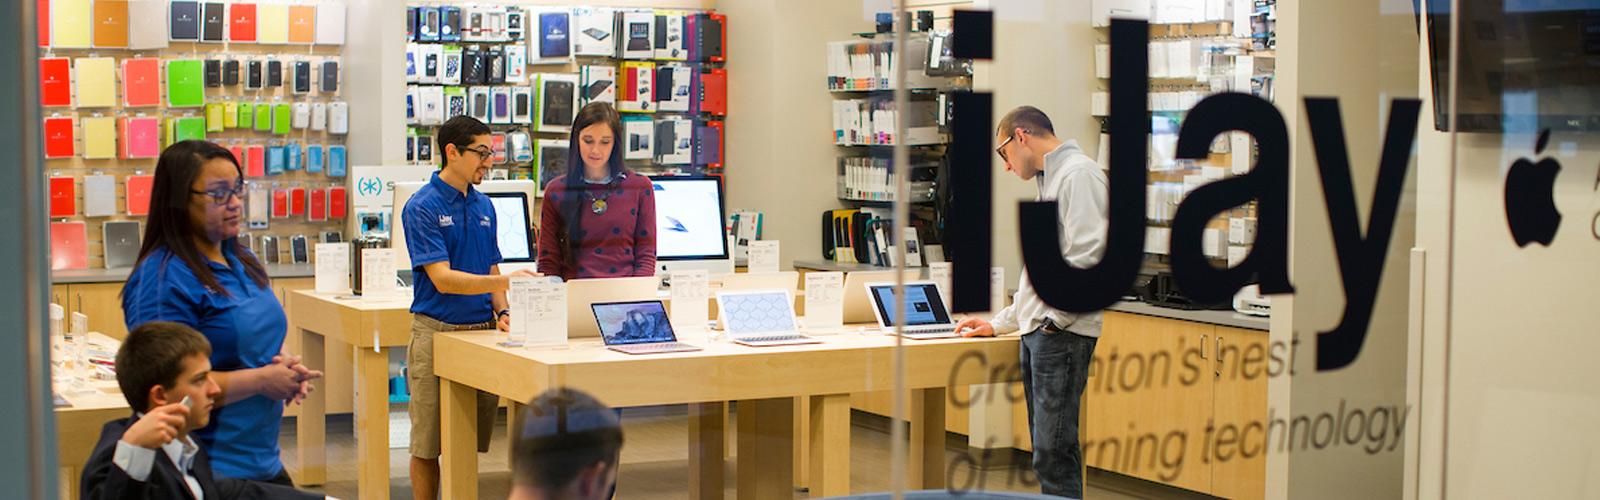 Creighton University Apple Store